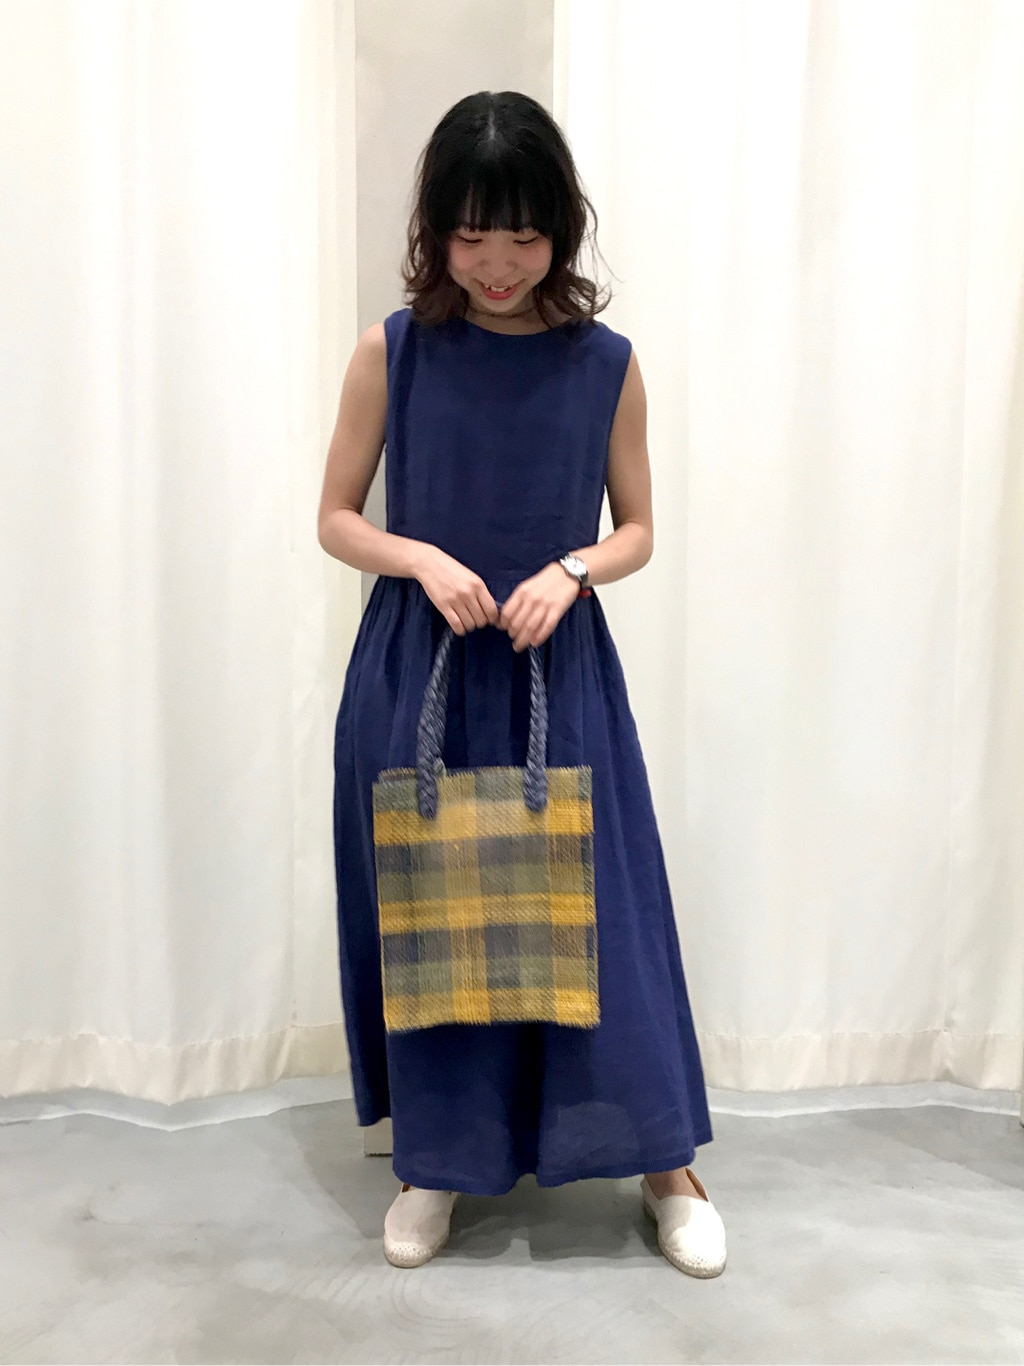 AMB SHOP PAR ICI CHILD WOMAN , PAR ICI 東京スカイツリータウン・ソラマチ 身長:154cm 2020.06.25